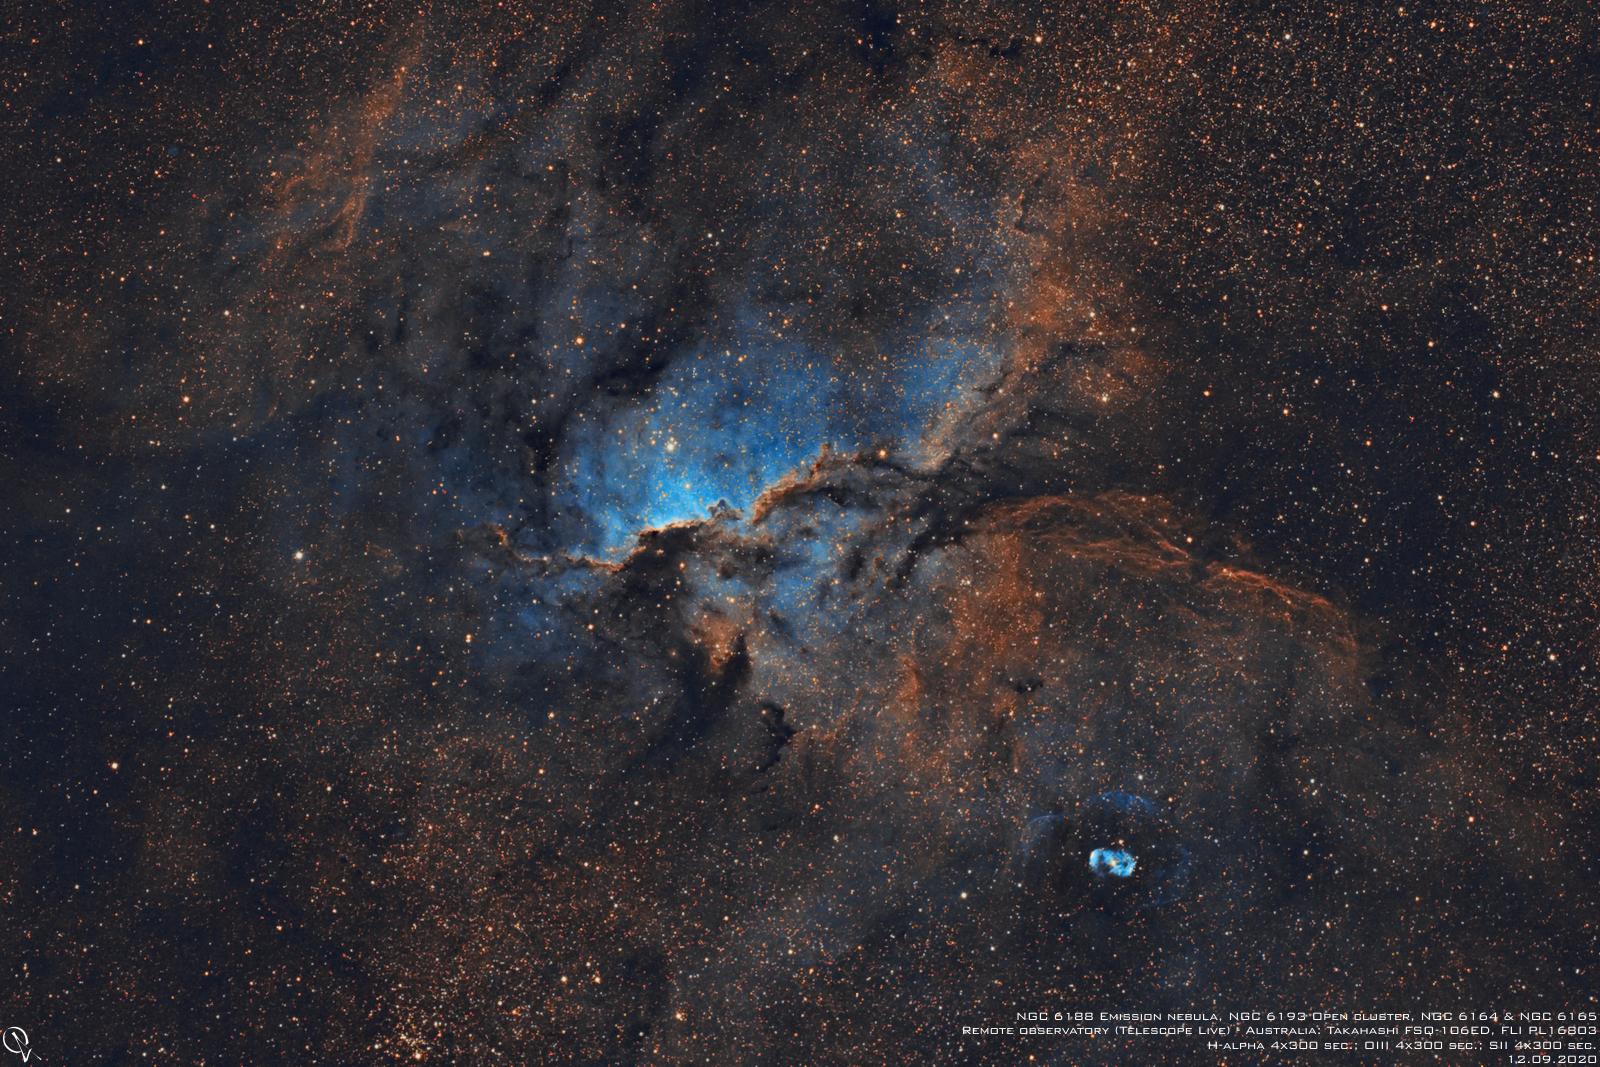 NGC-6188.png.a162eadc4833e8b9ee7795fc715ac0dc.png